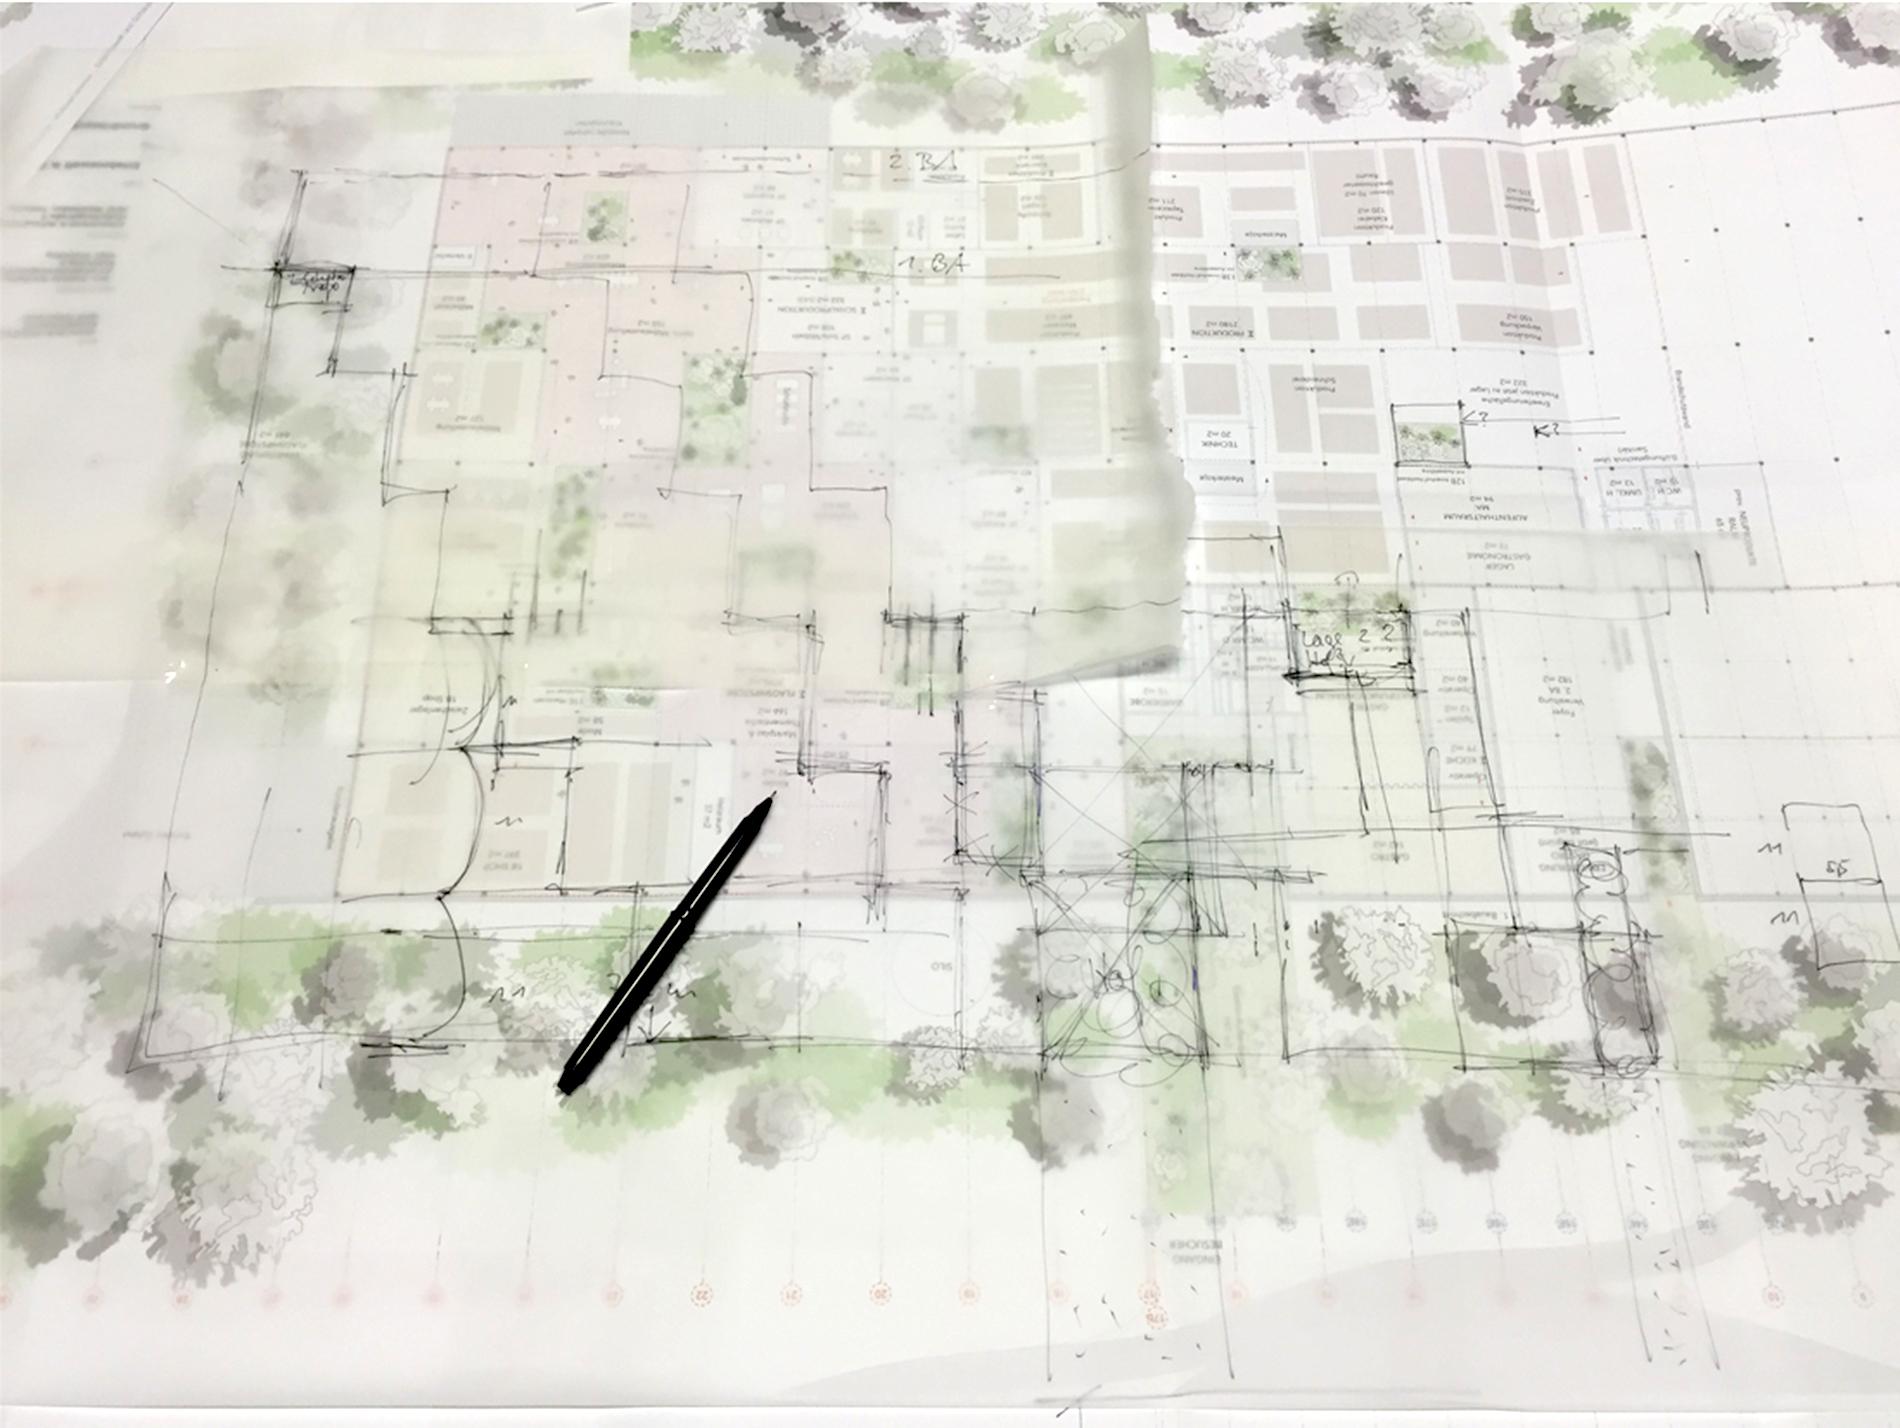 Grüne erde sketch